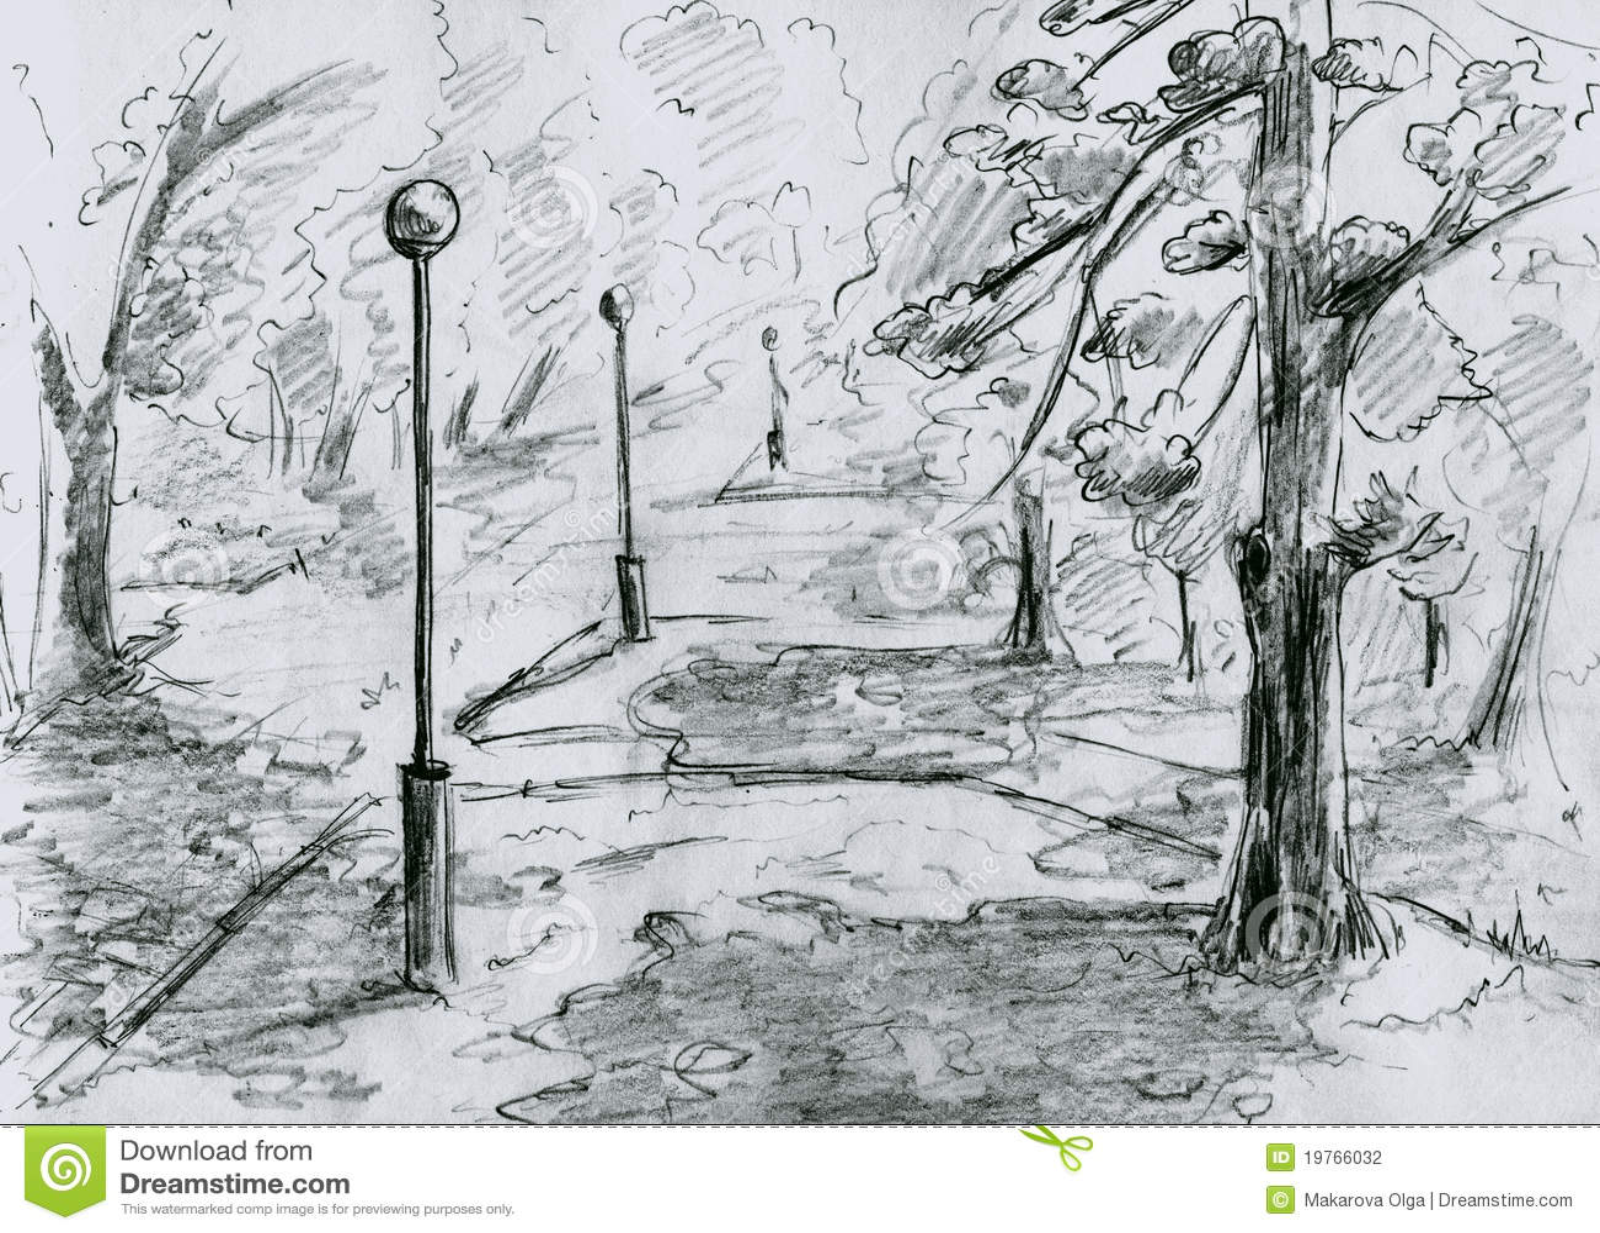 risunok-park